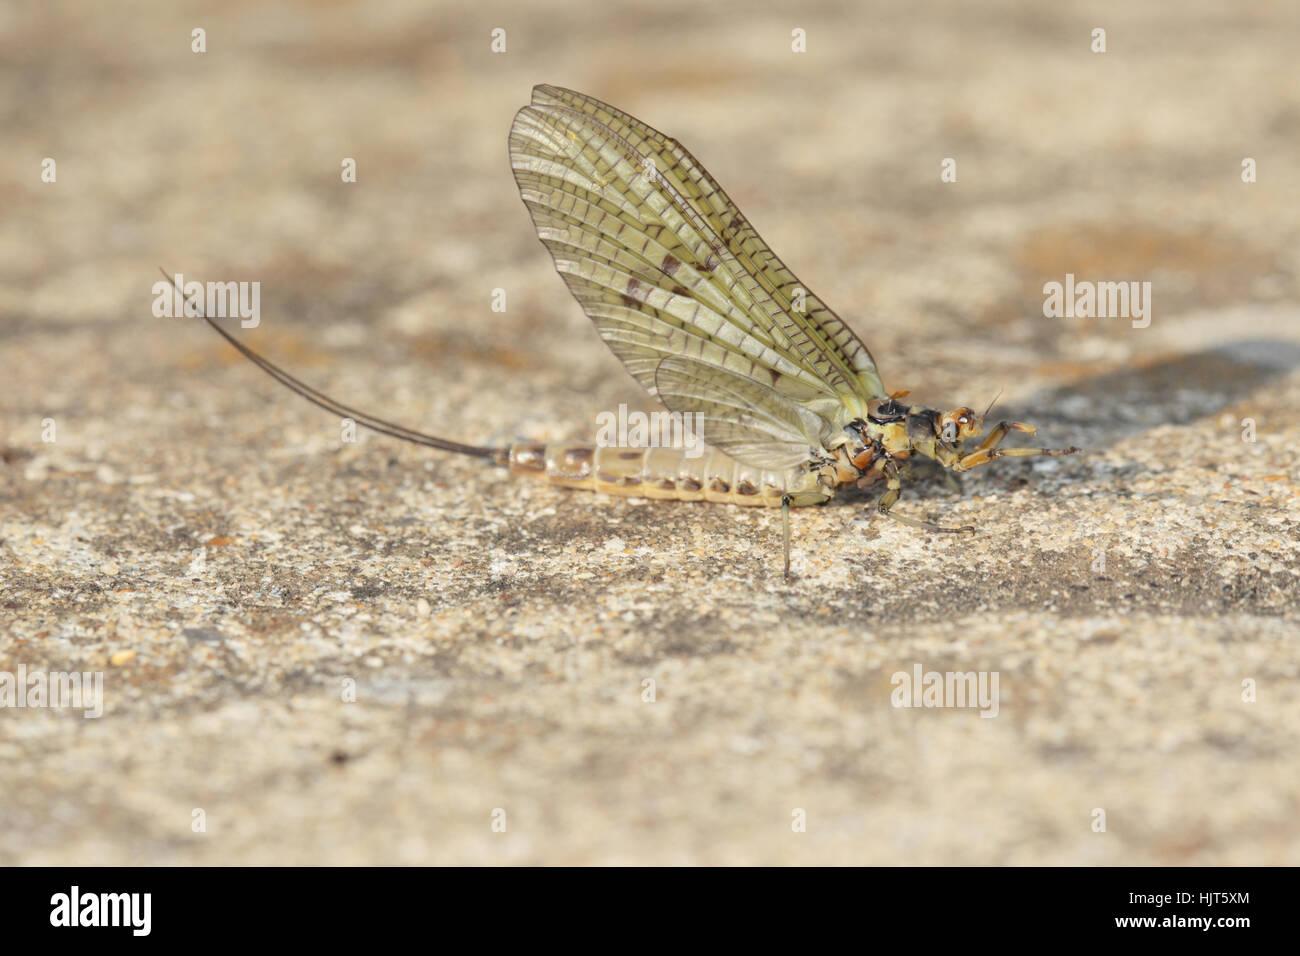 Green Drake Mayfly (Ephemera danica) - a recently emerged adult on a stone in a suburban garden - Stock Image